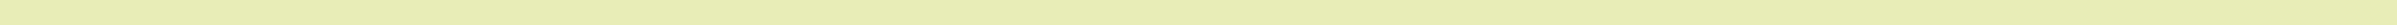 H25.8.22    虹の輪っか_b0184721_11143585.jpg